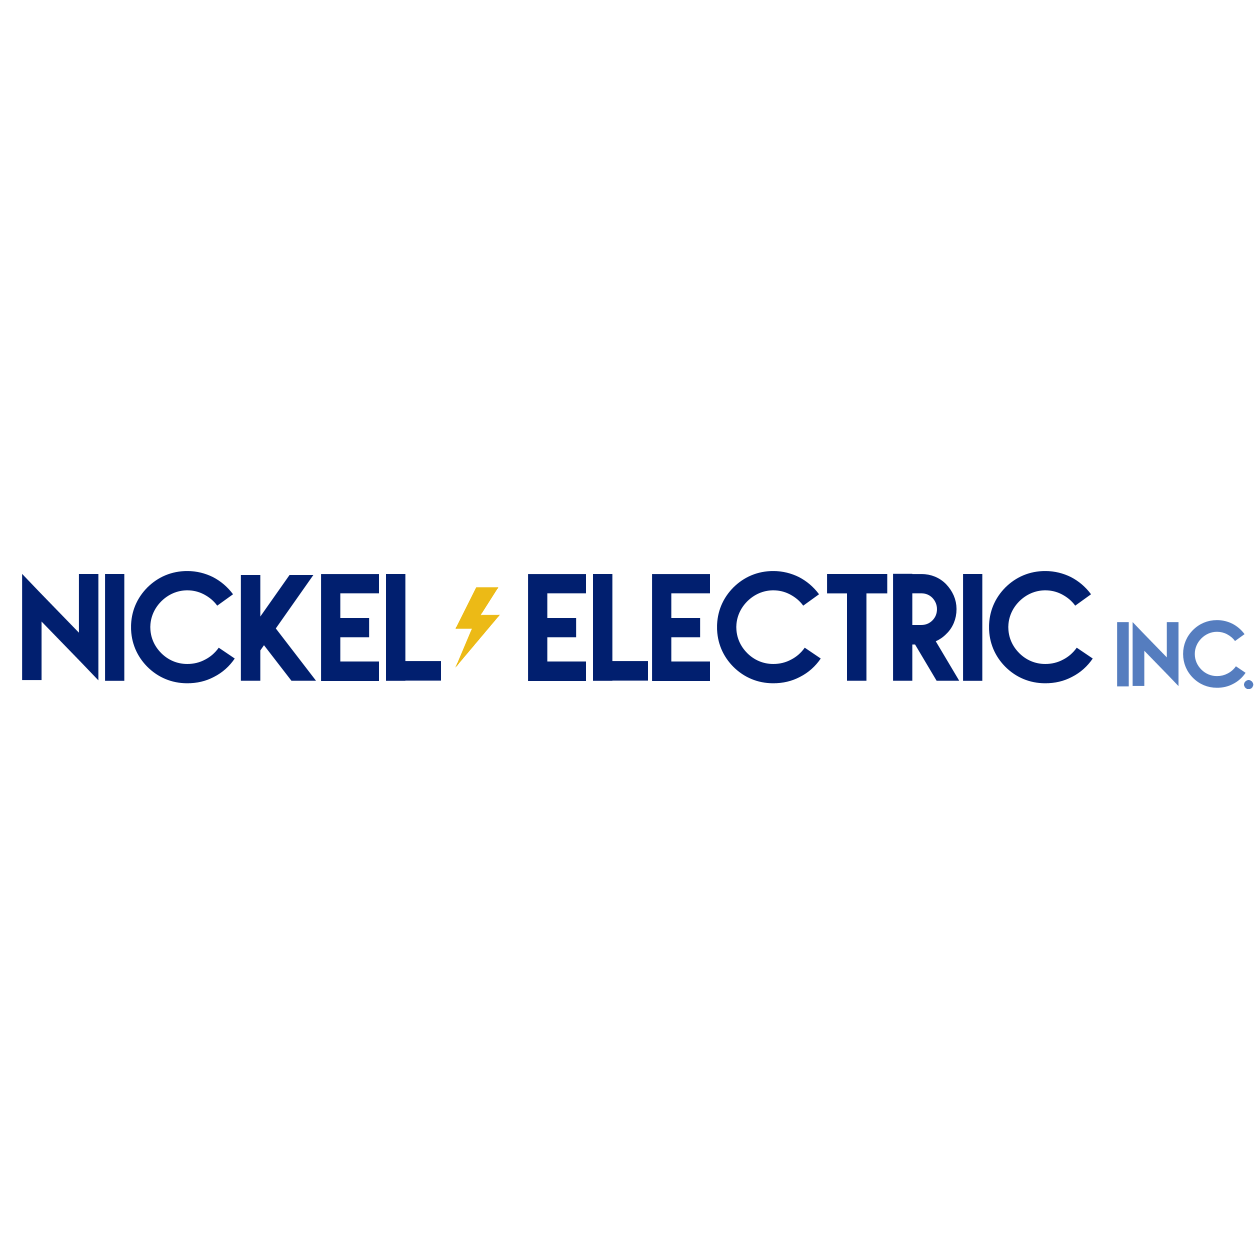 Nickel Electric Inc. - Secaucus, NJ 07094 - (201)865-0053 | ShowMeLocal.com